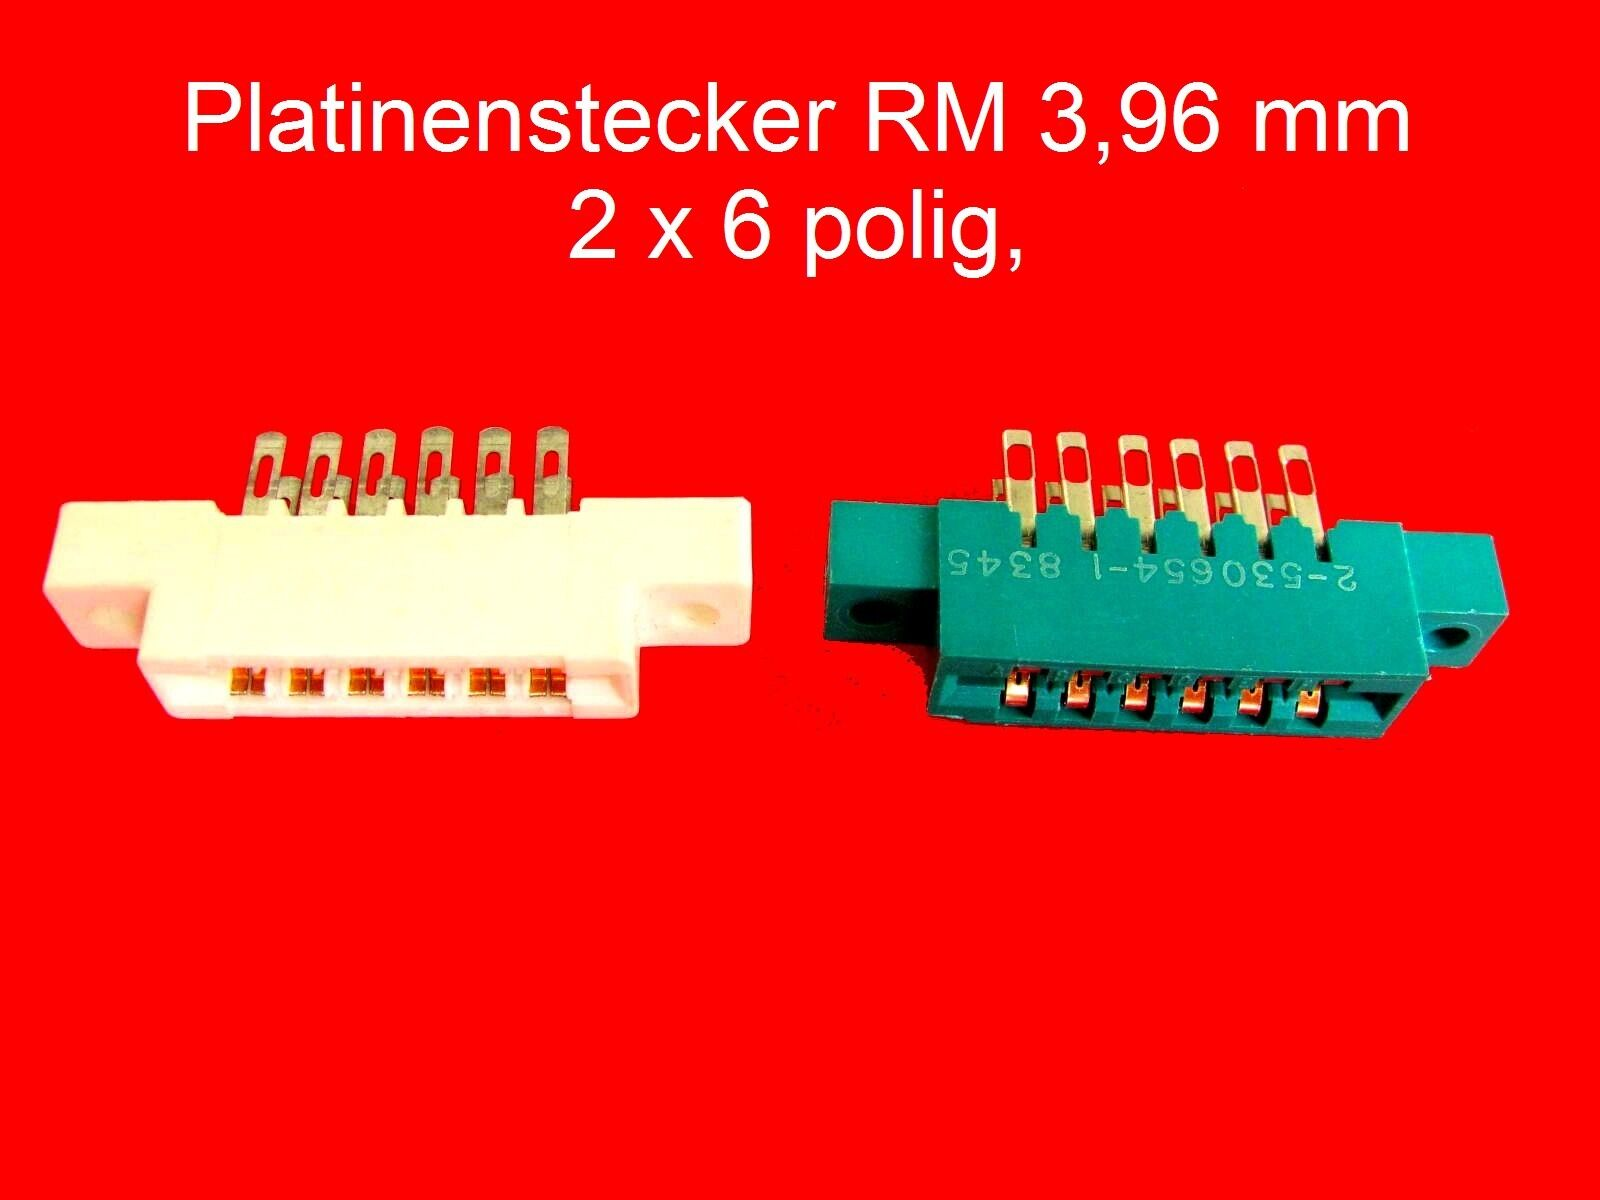 platinenstecker 38 kontakte rm 2 54 steckverbinder leiterplattenmontage eur 6 00 picclick de. Black Bedroom Furniture Sets. Home Design Ideas